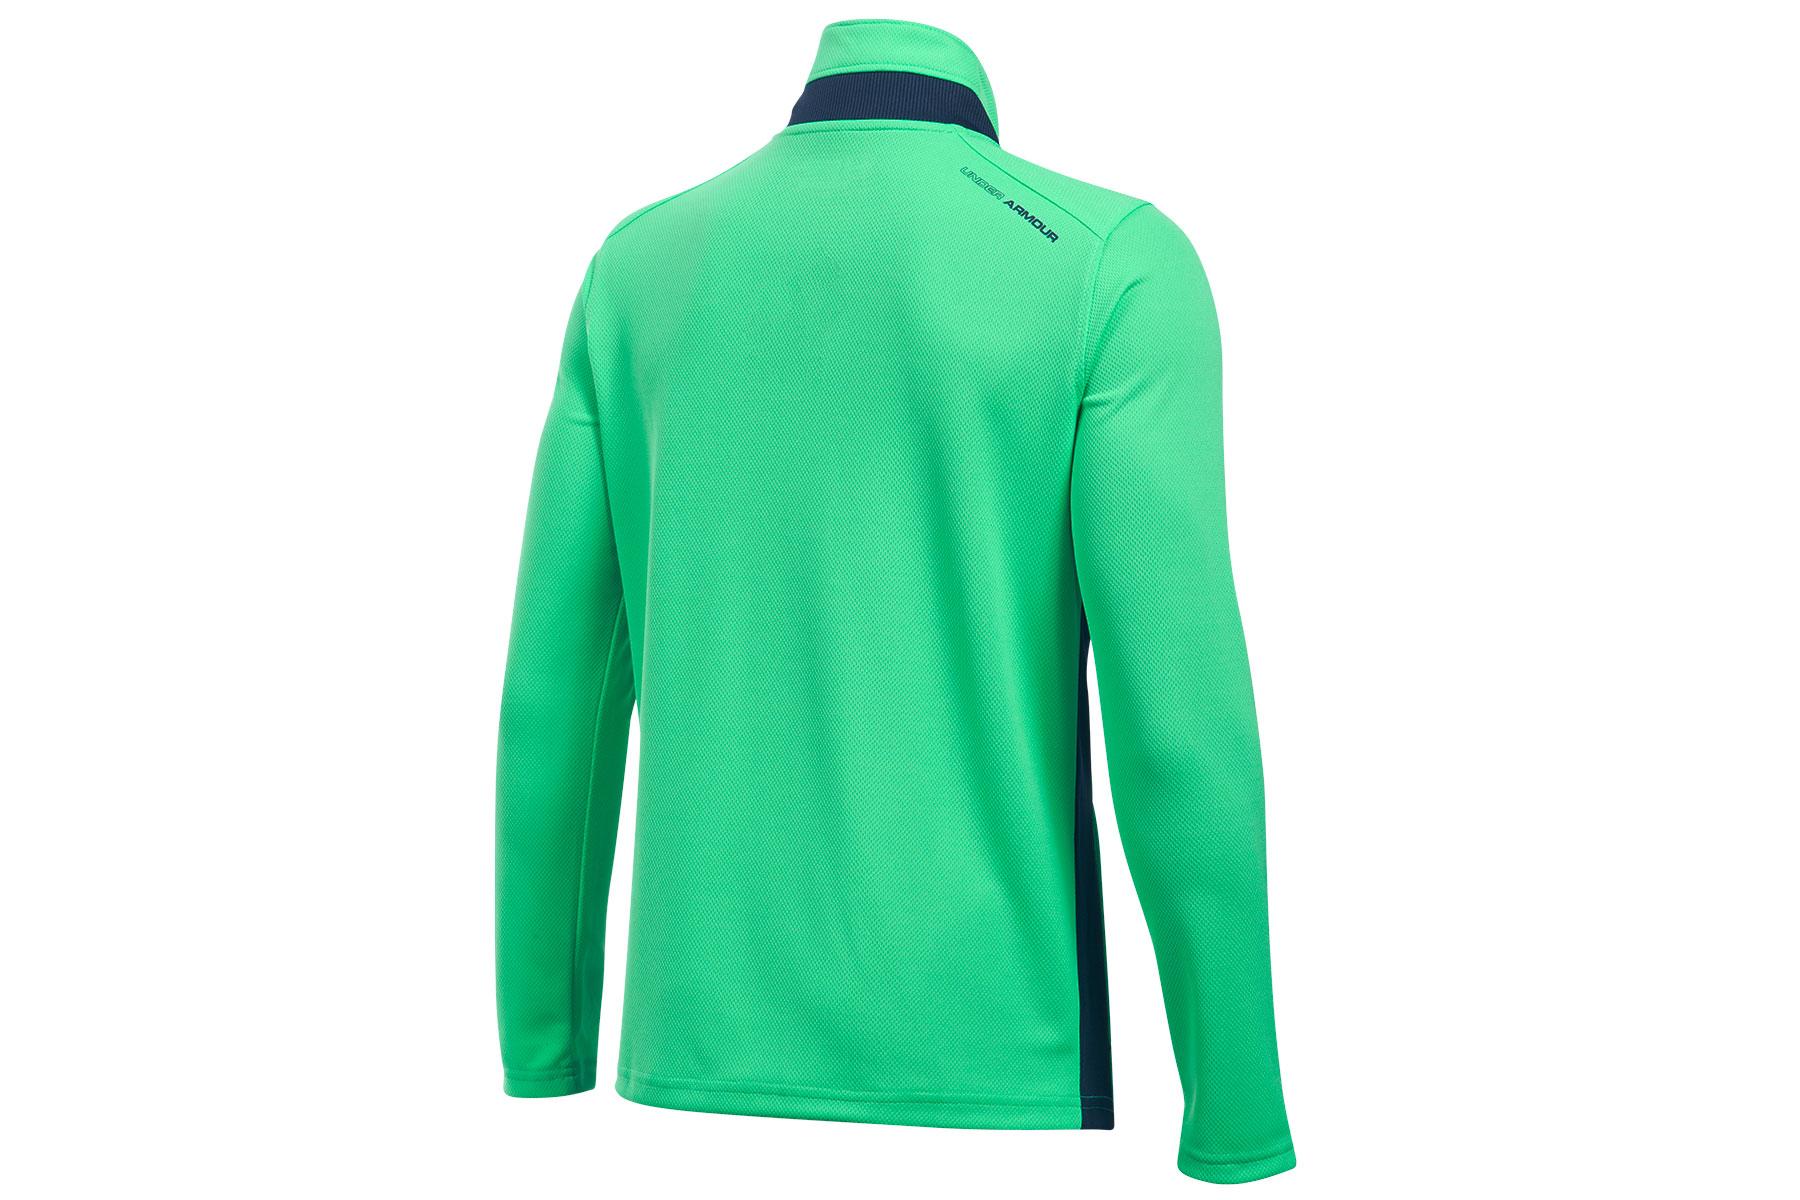 Under armour 1 4 zip junior windshirt from american golf for Housse zip collection captur